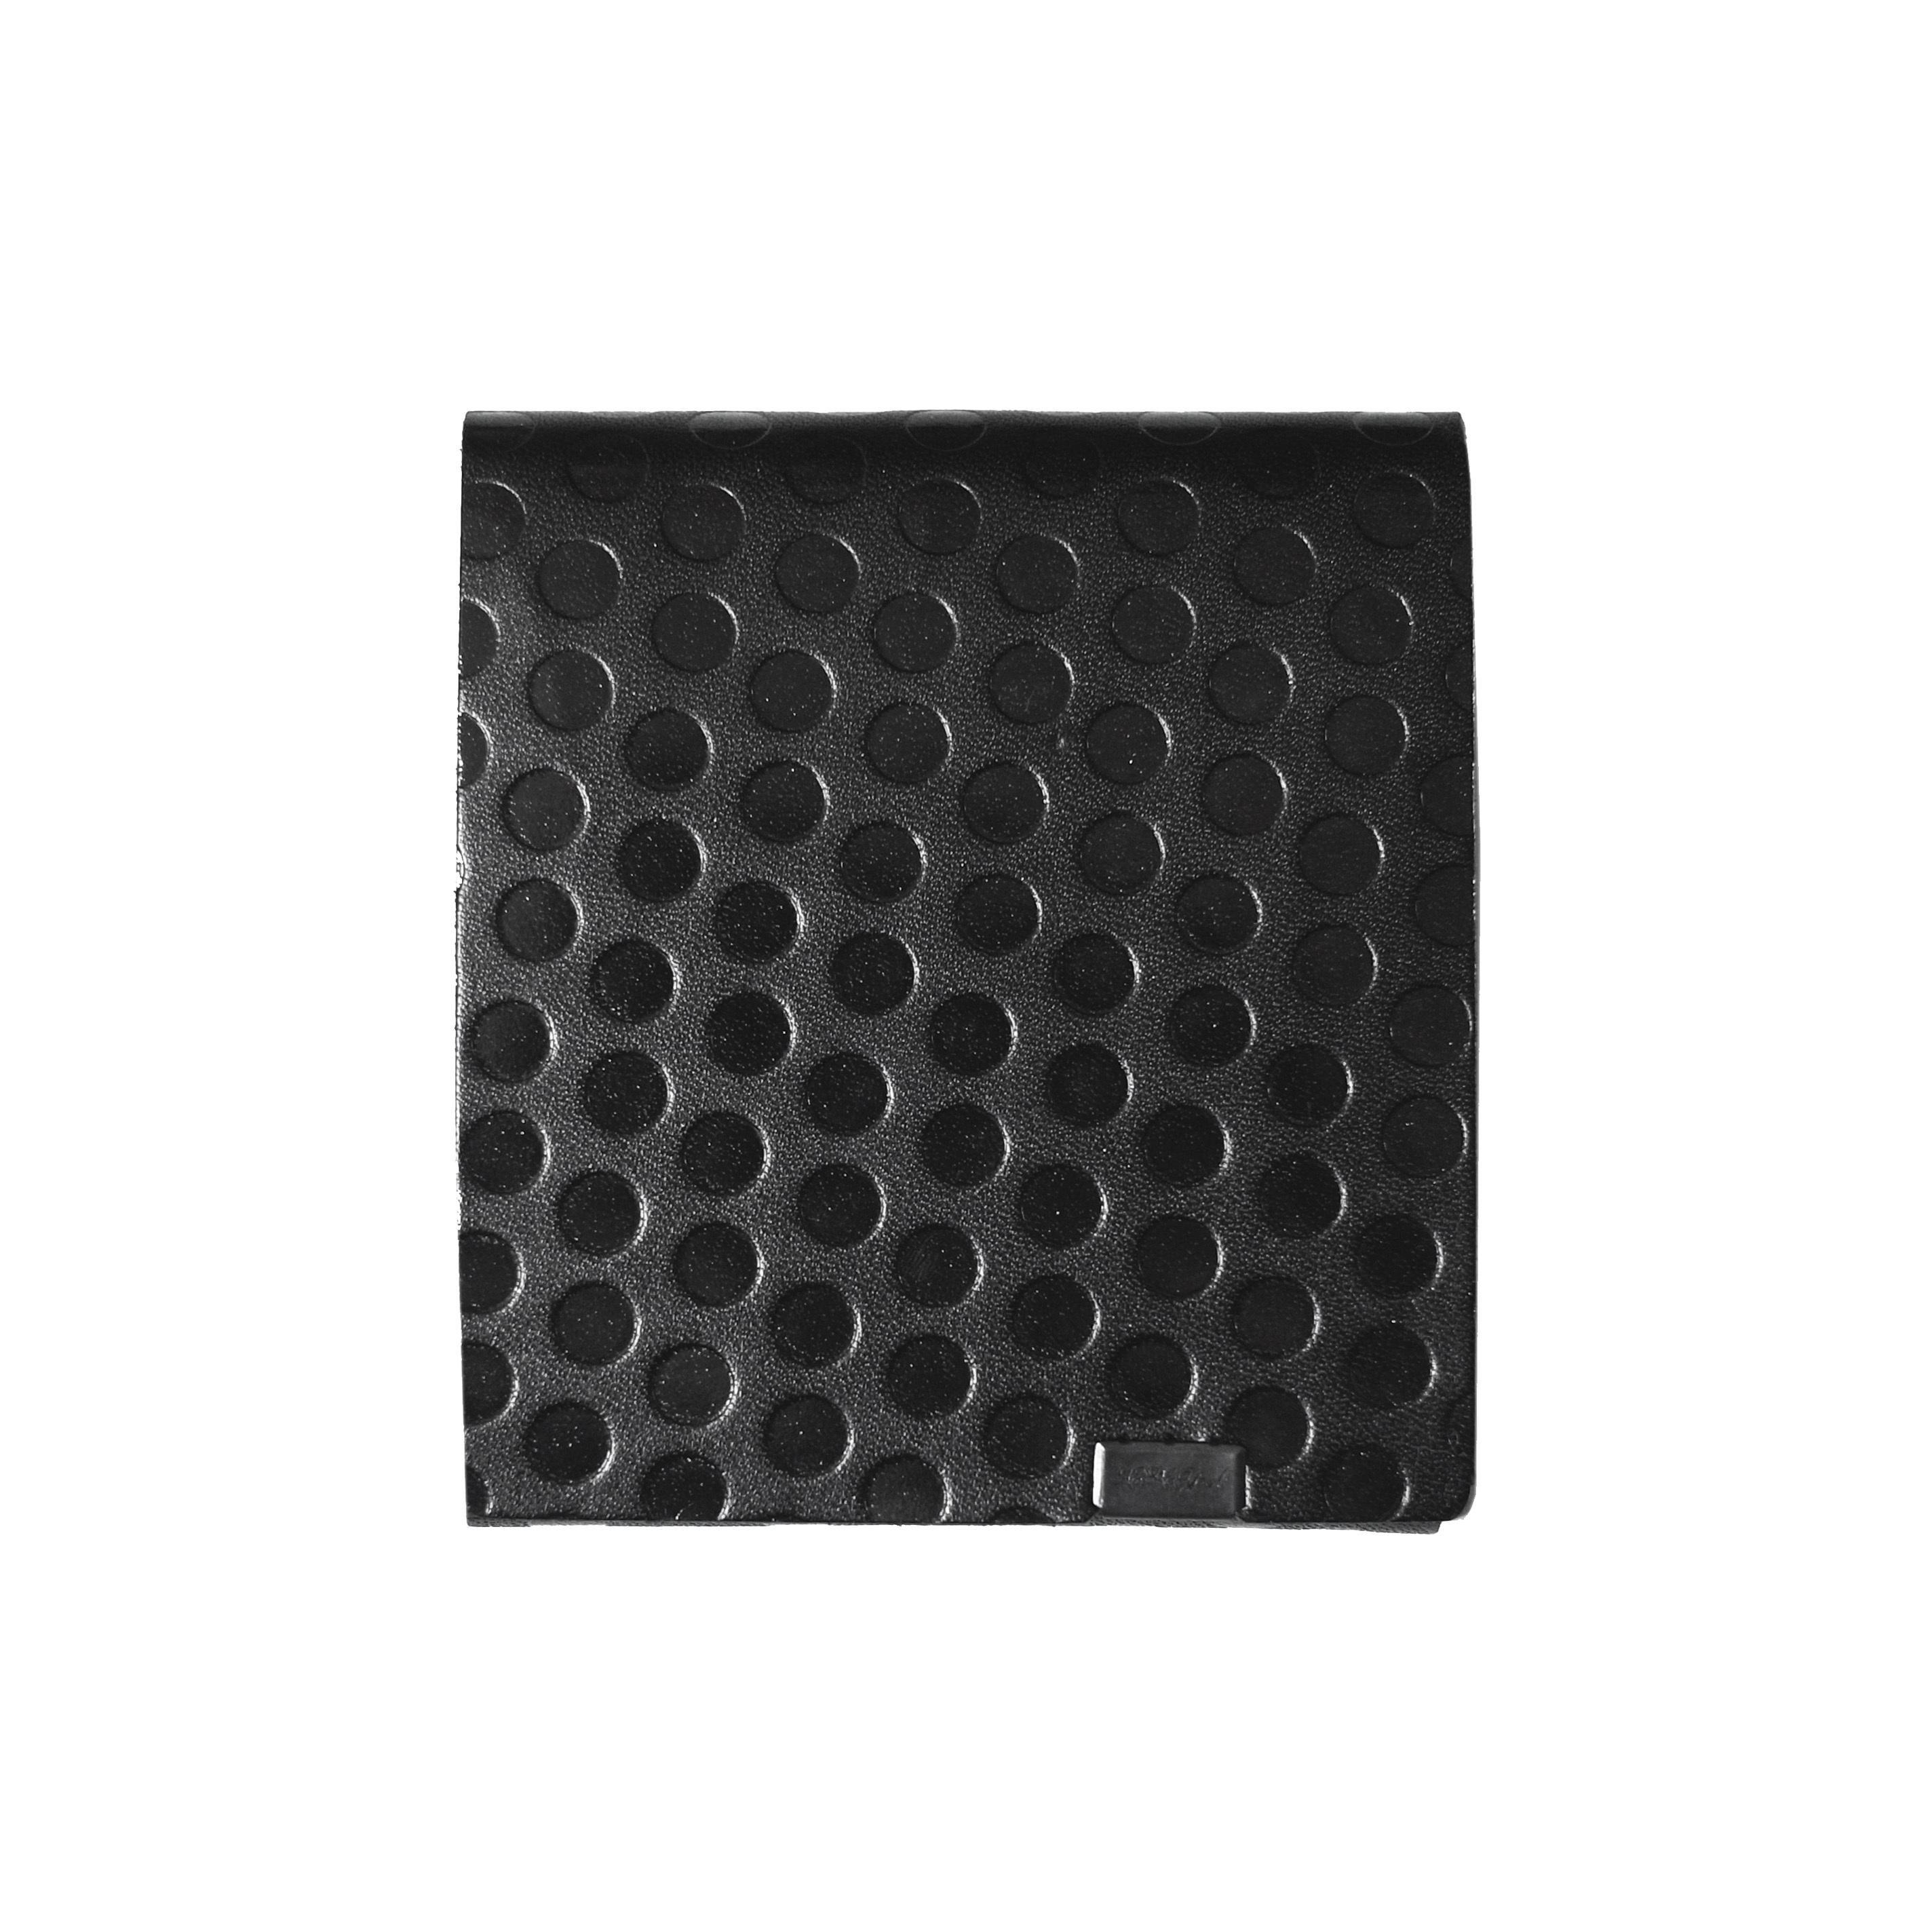 PolkaDot -ショートウォレット2.0- ブラック×ブラックドット